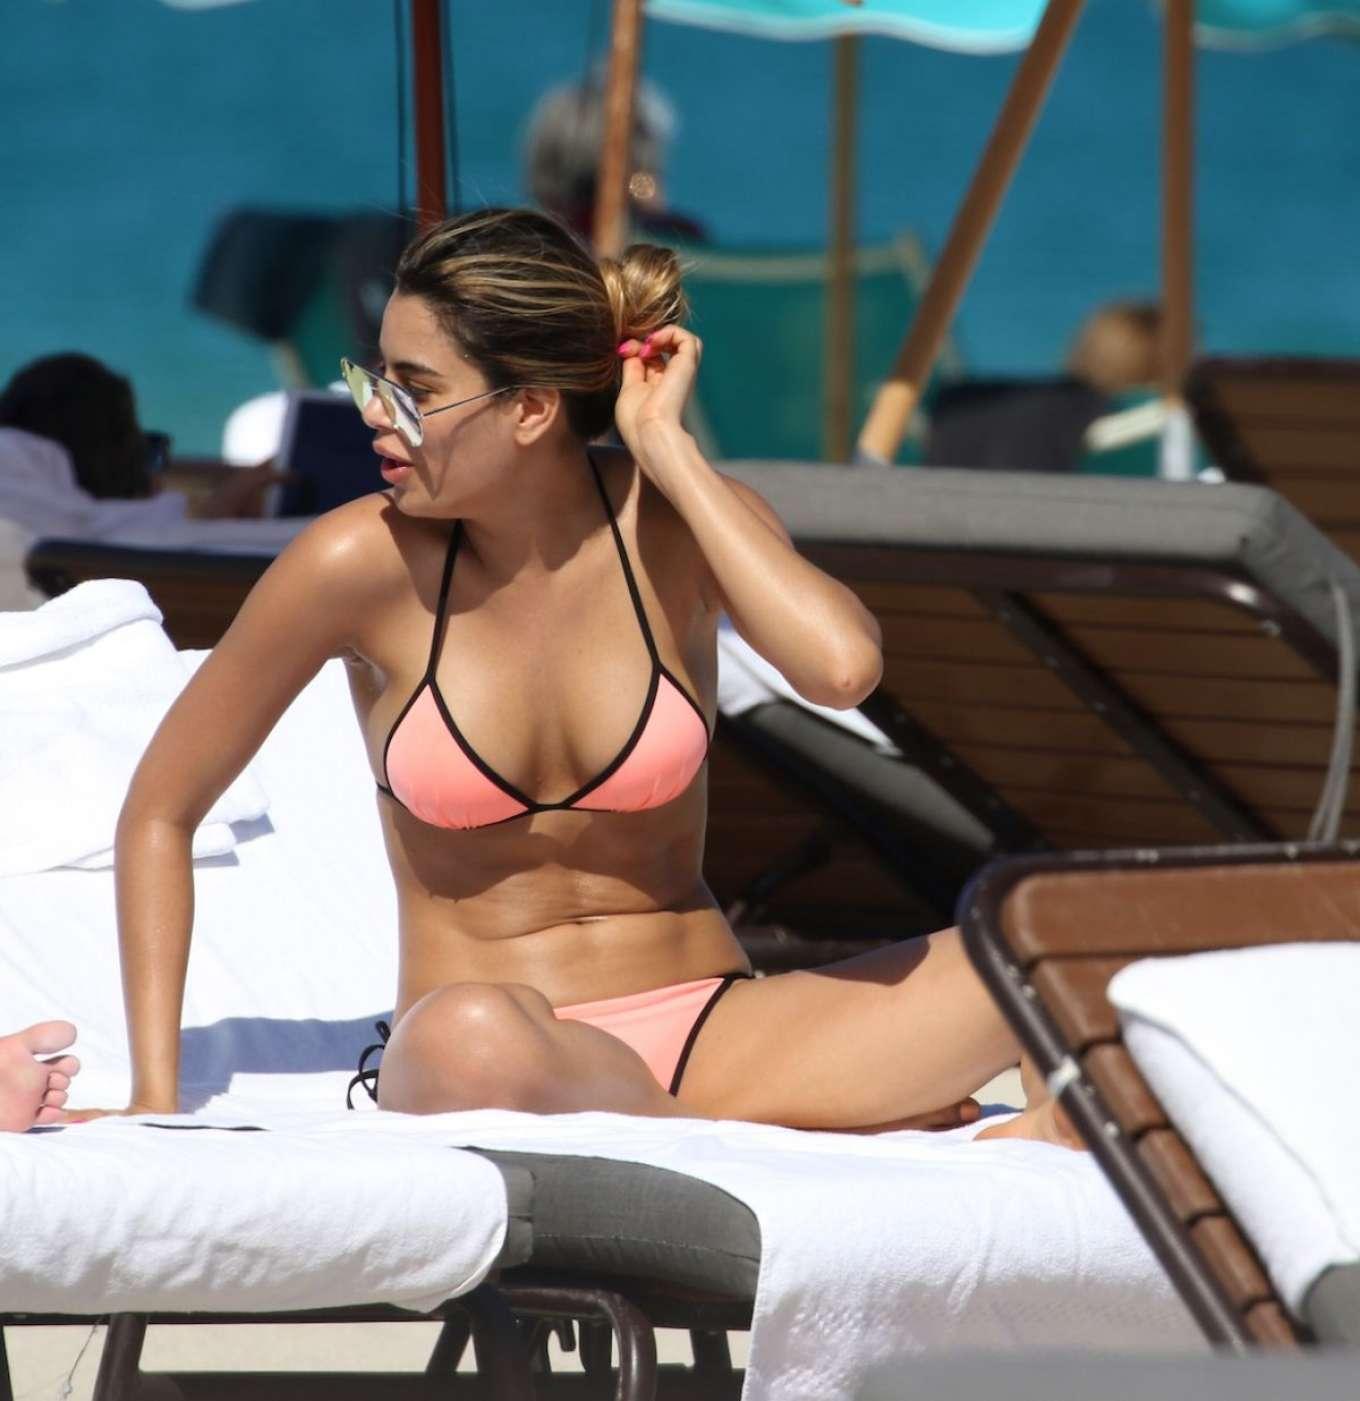 Bikini Ariadna Gutierrez nude (31 photos), Sexy